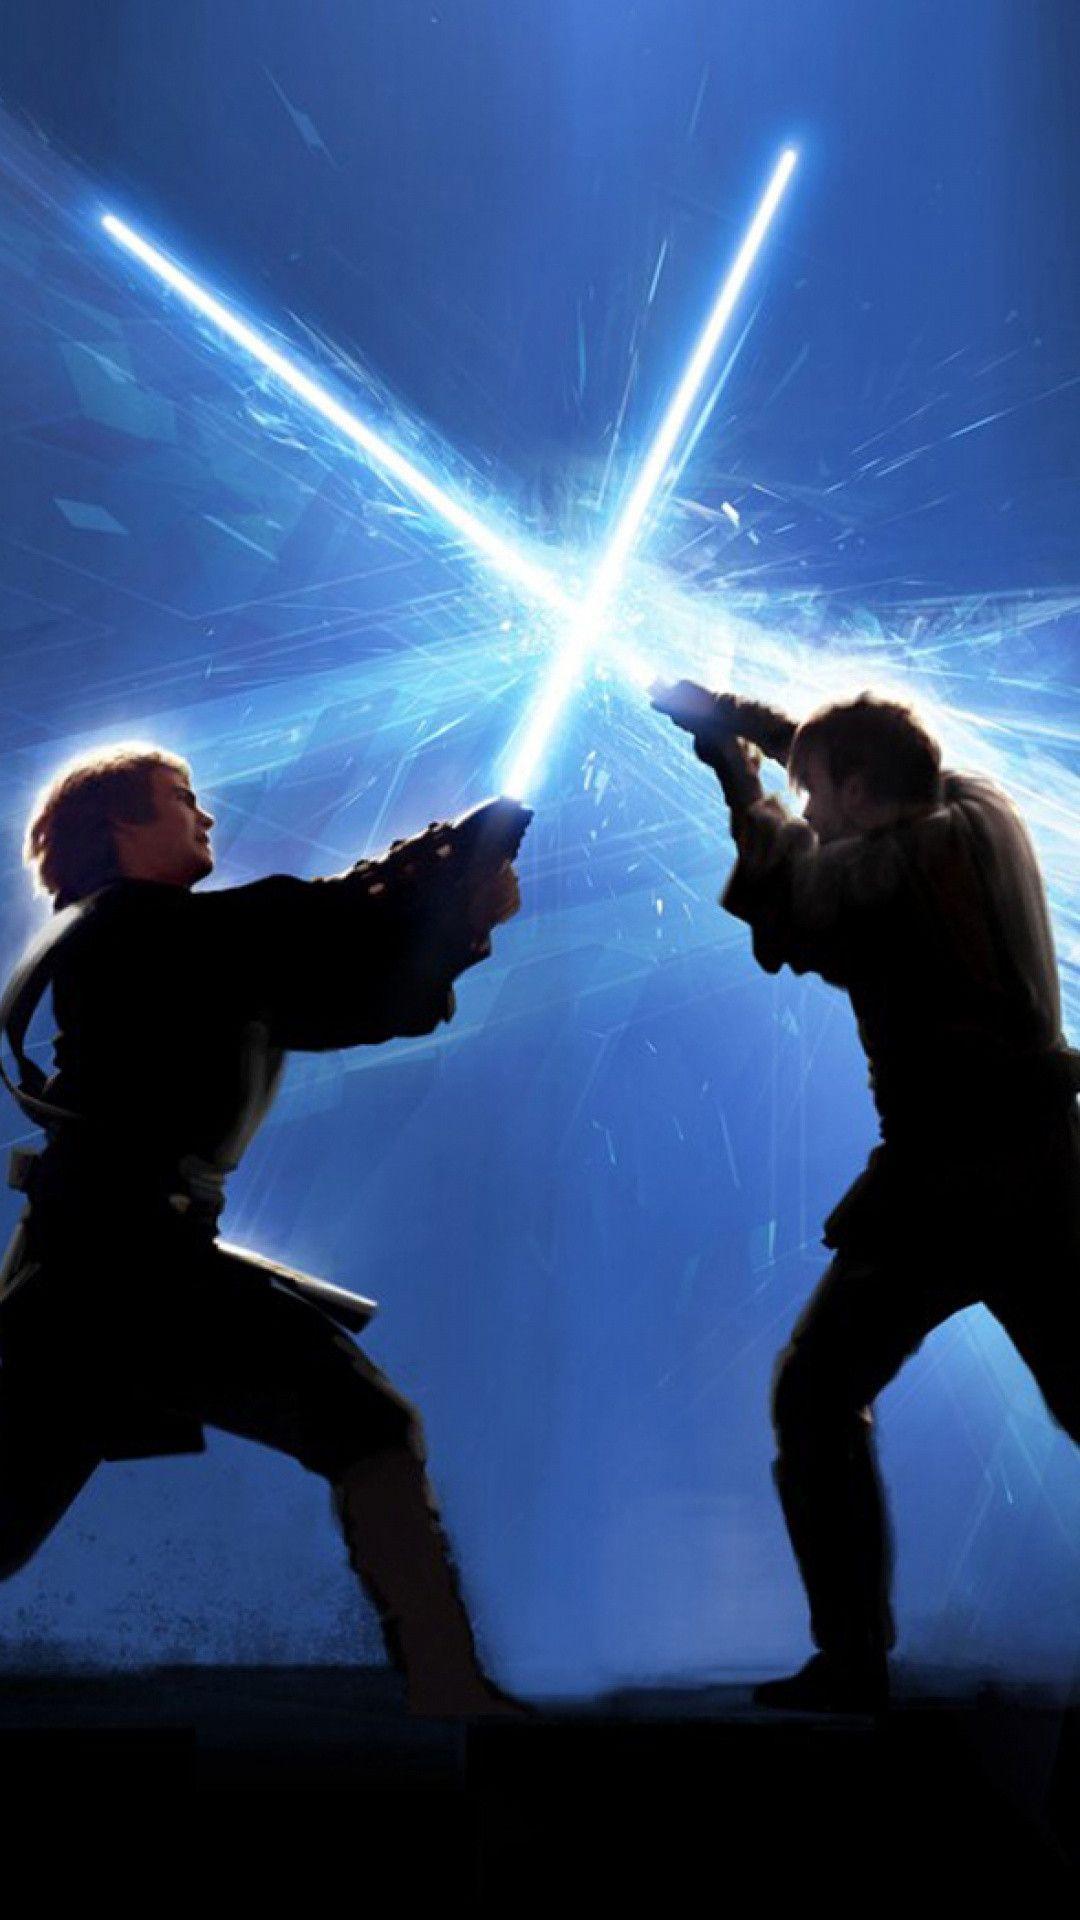 Anakin Vs Obi Wan Battle Of The Heroes Star Wars Episode Iii